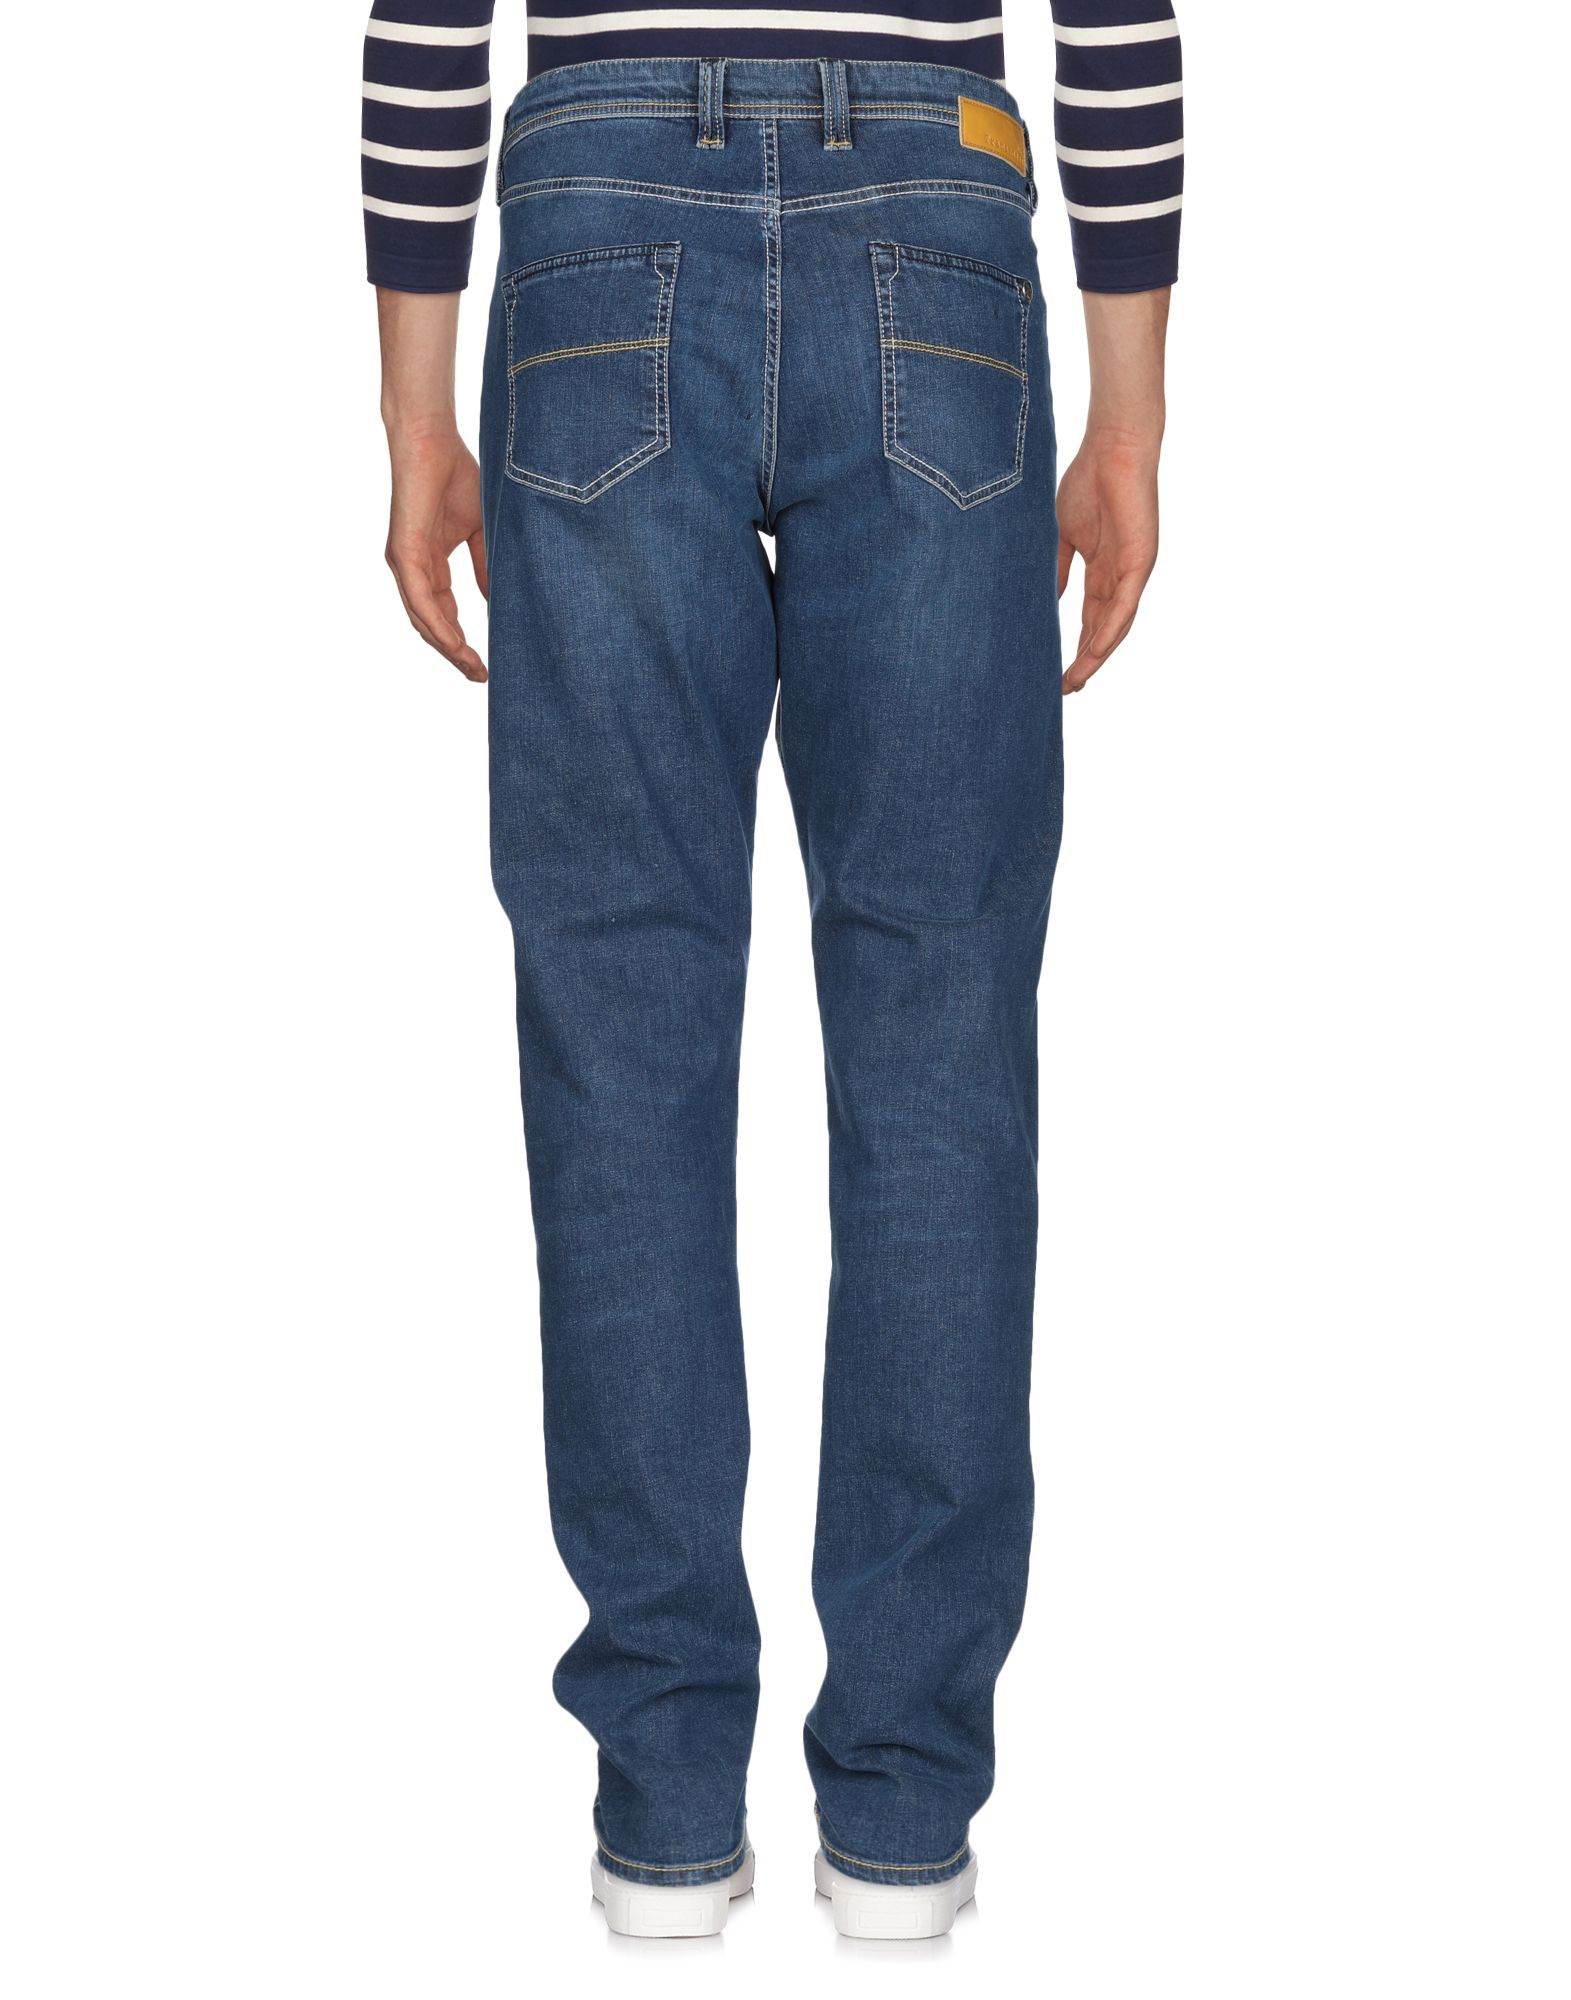 Pantaloni Tramarossa Jeans Tramarossa Pantaloni Uomo - 42662719JM 9936c2